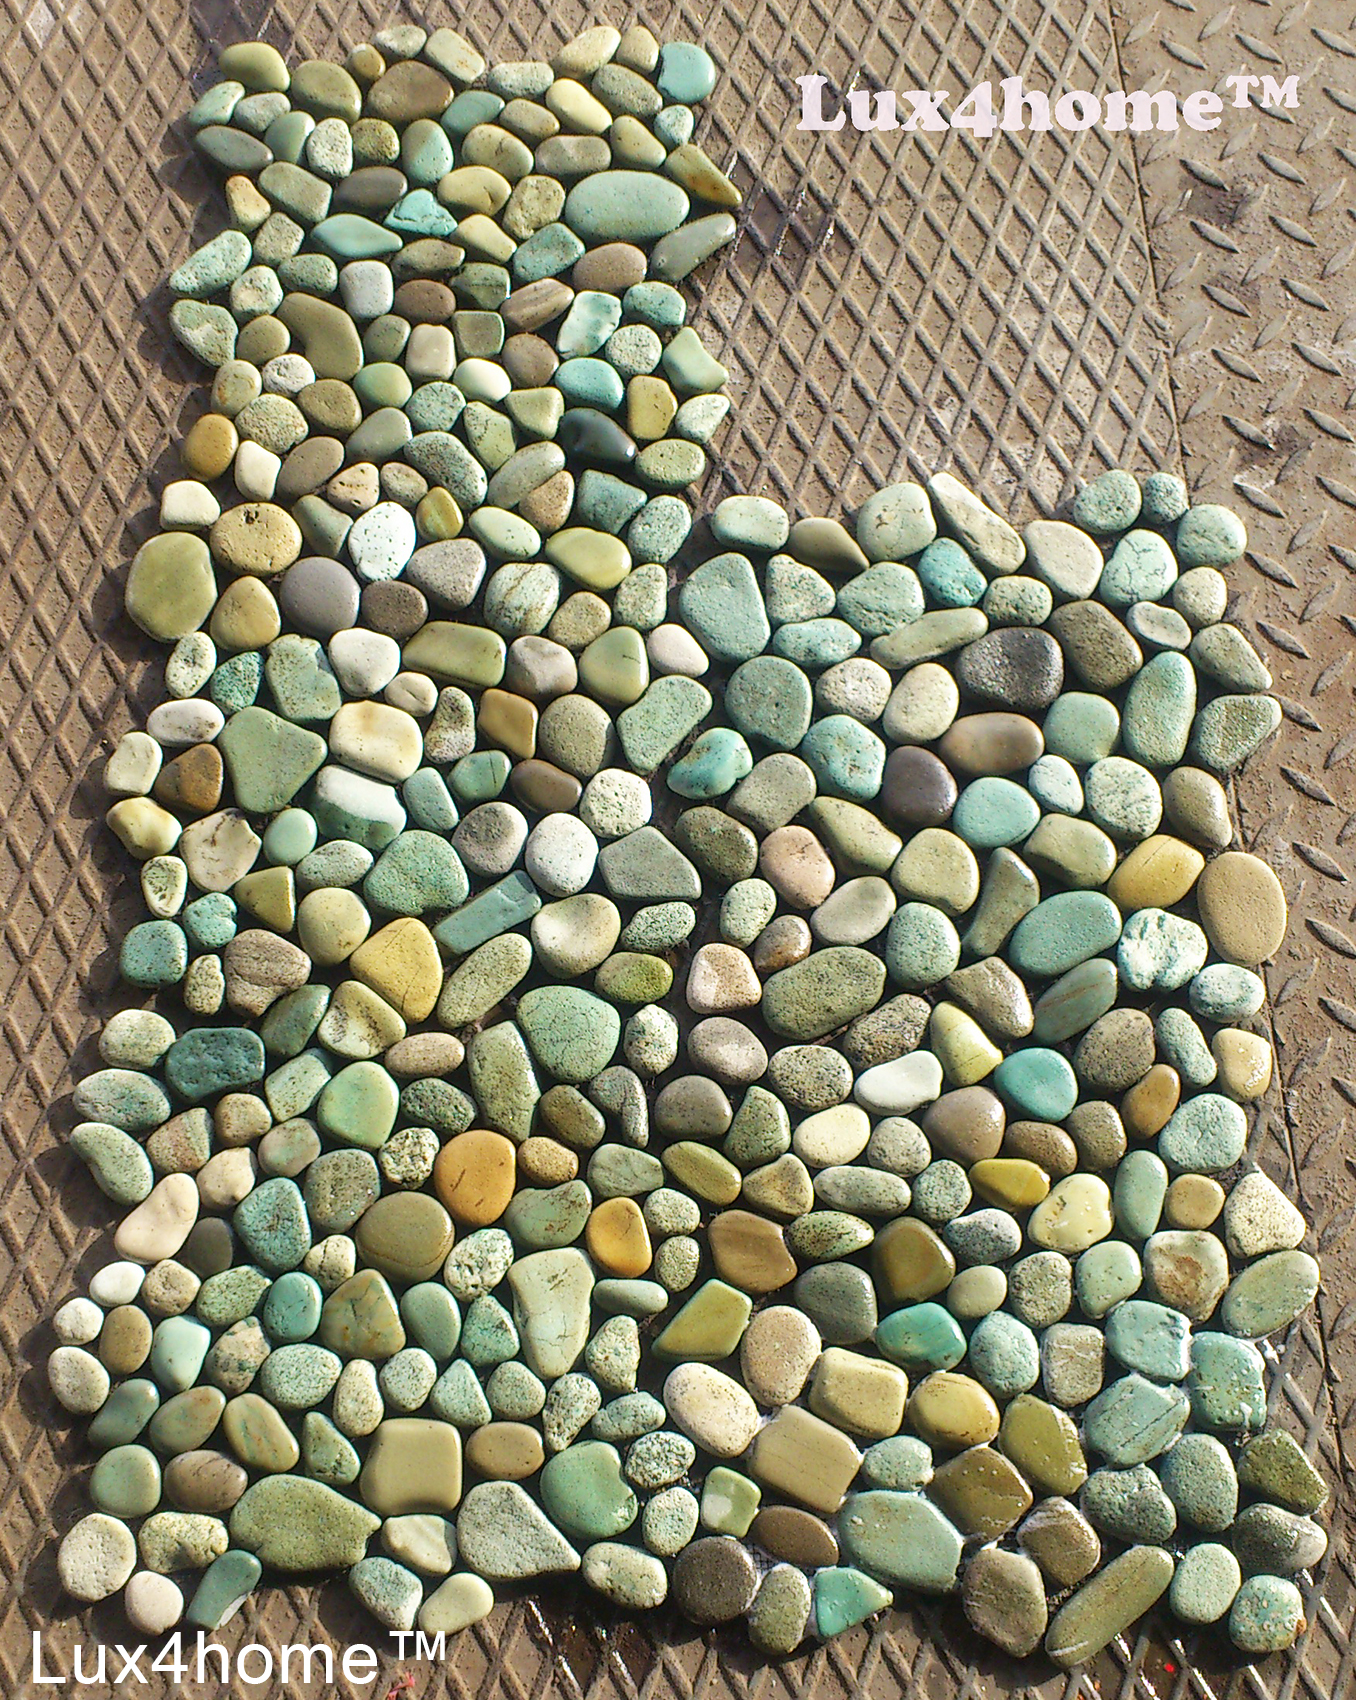 Green Pebble Tiles Taipei Green 30x30 Cm Lux4home Com